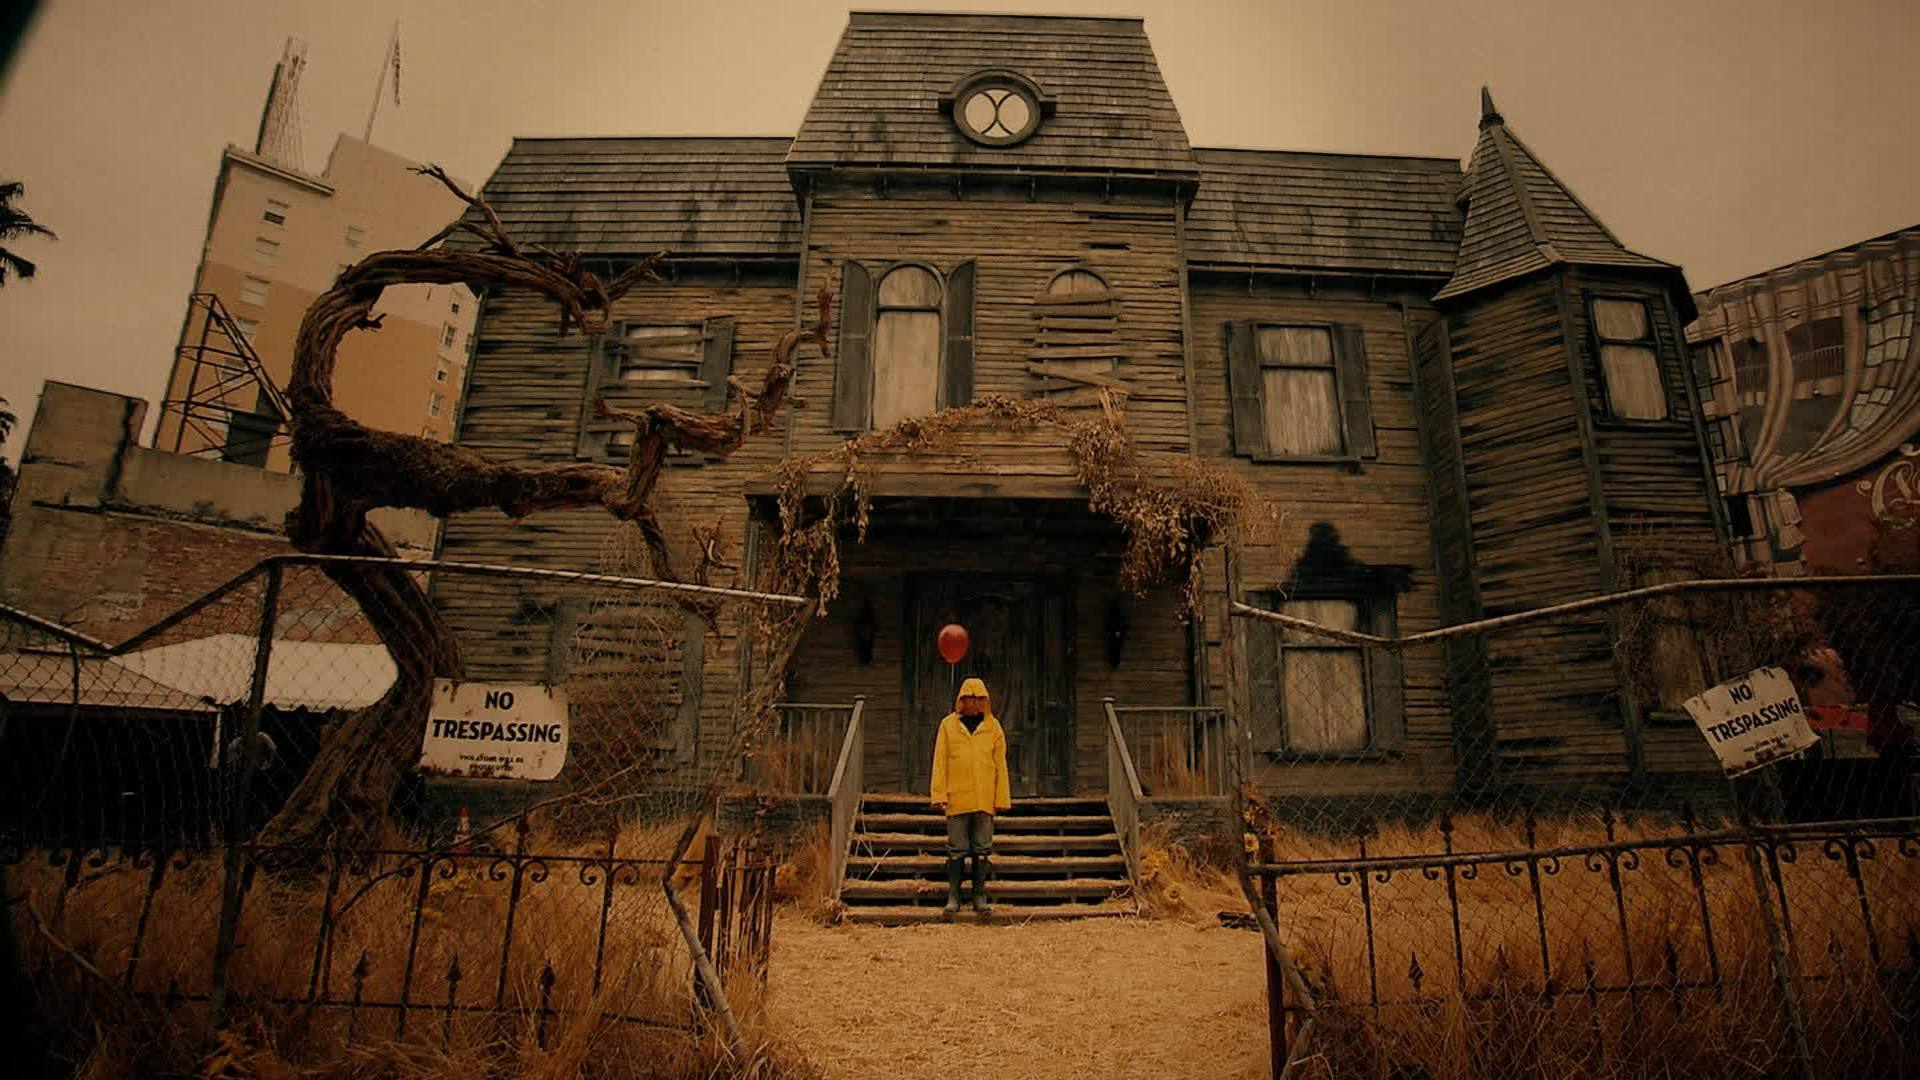 America Haunted houses